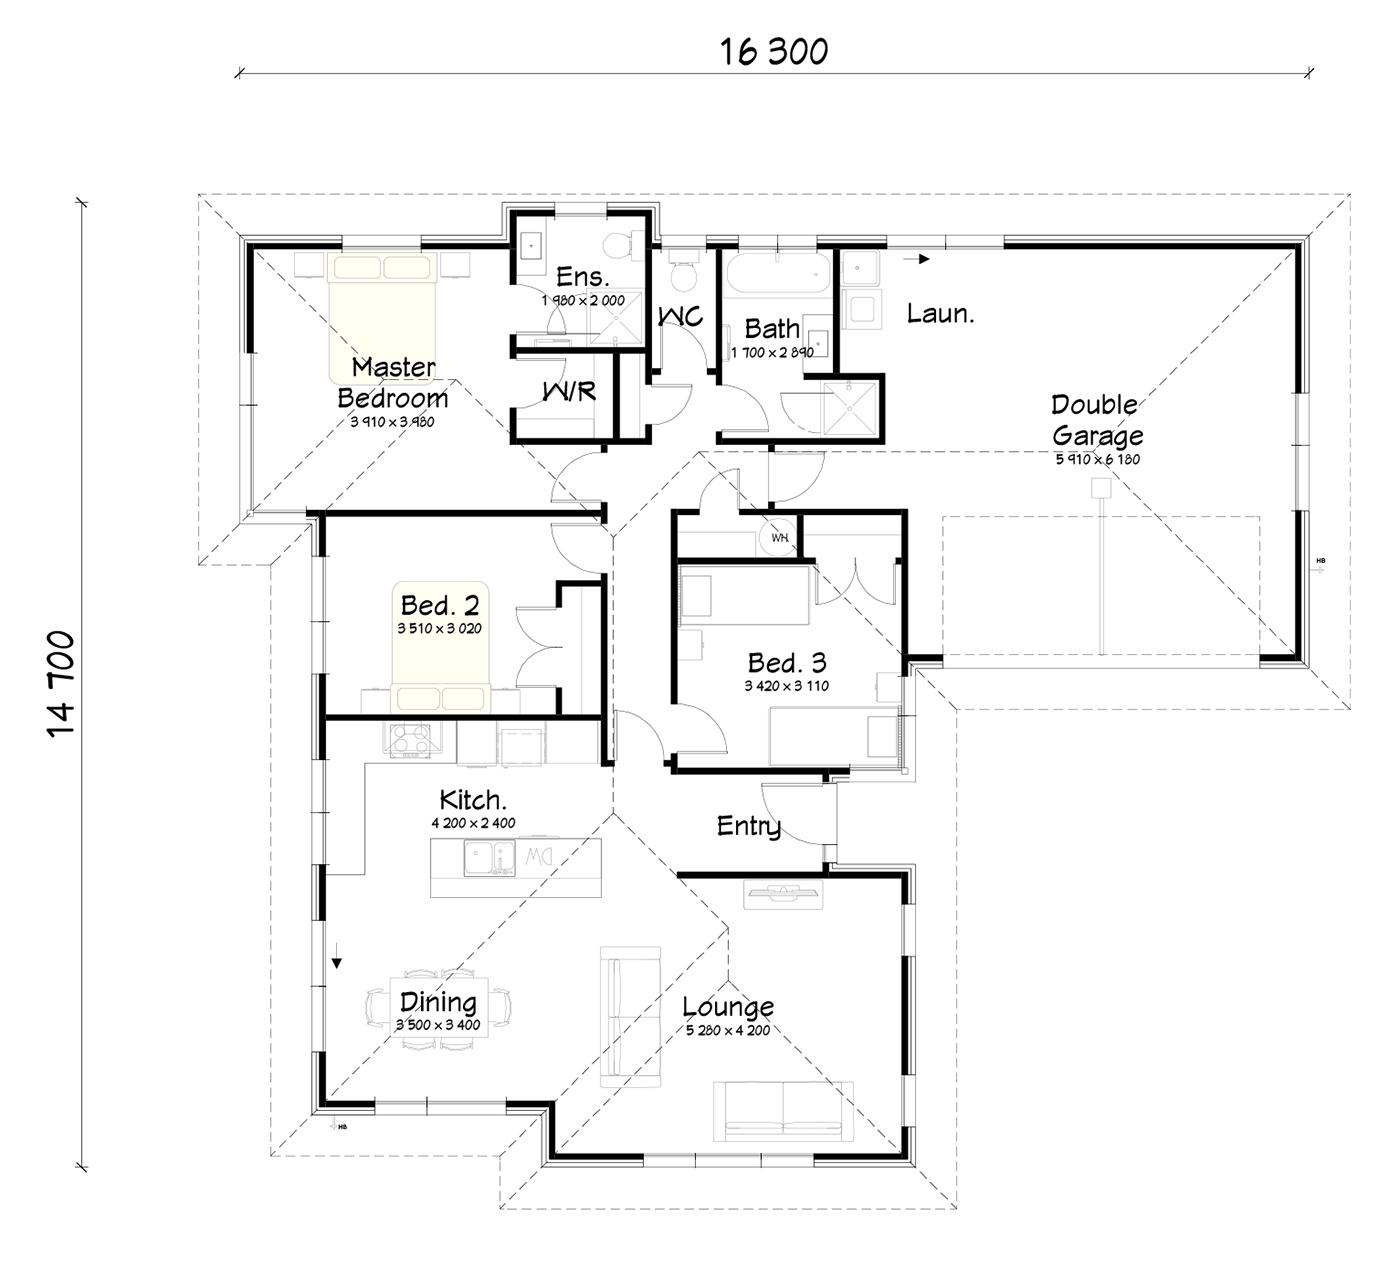 FH172 floorplan